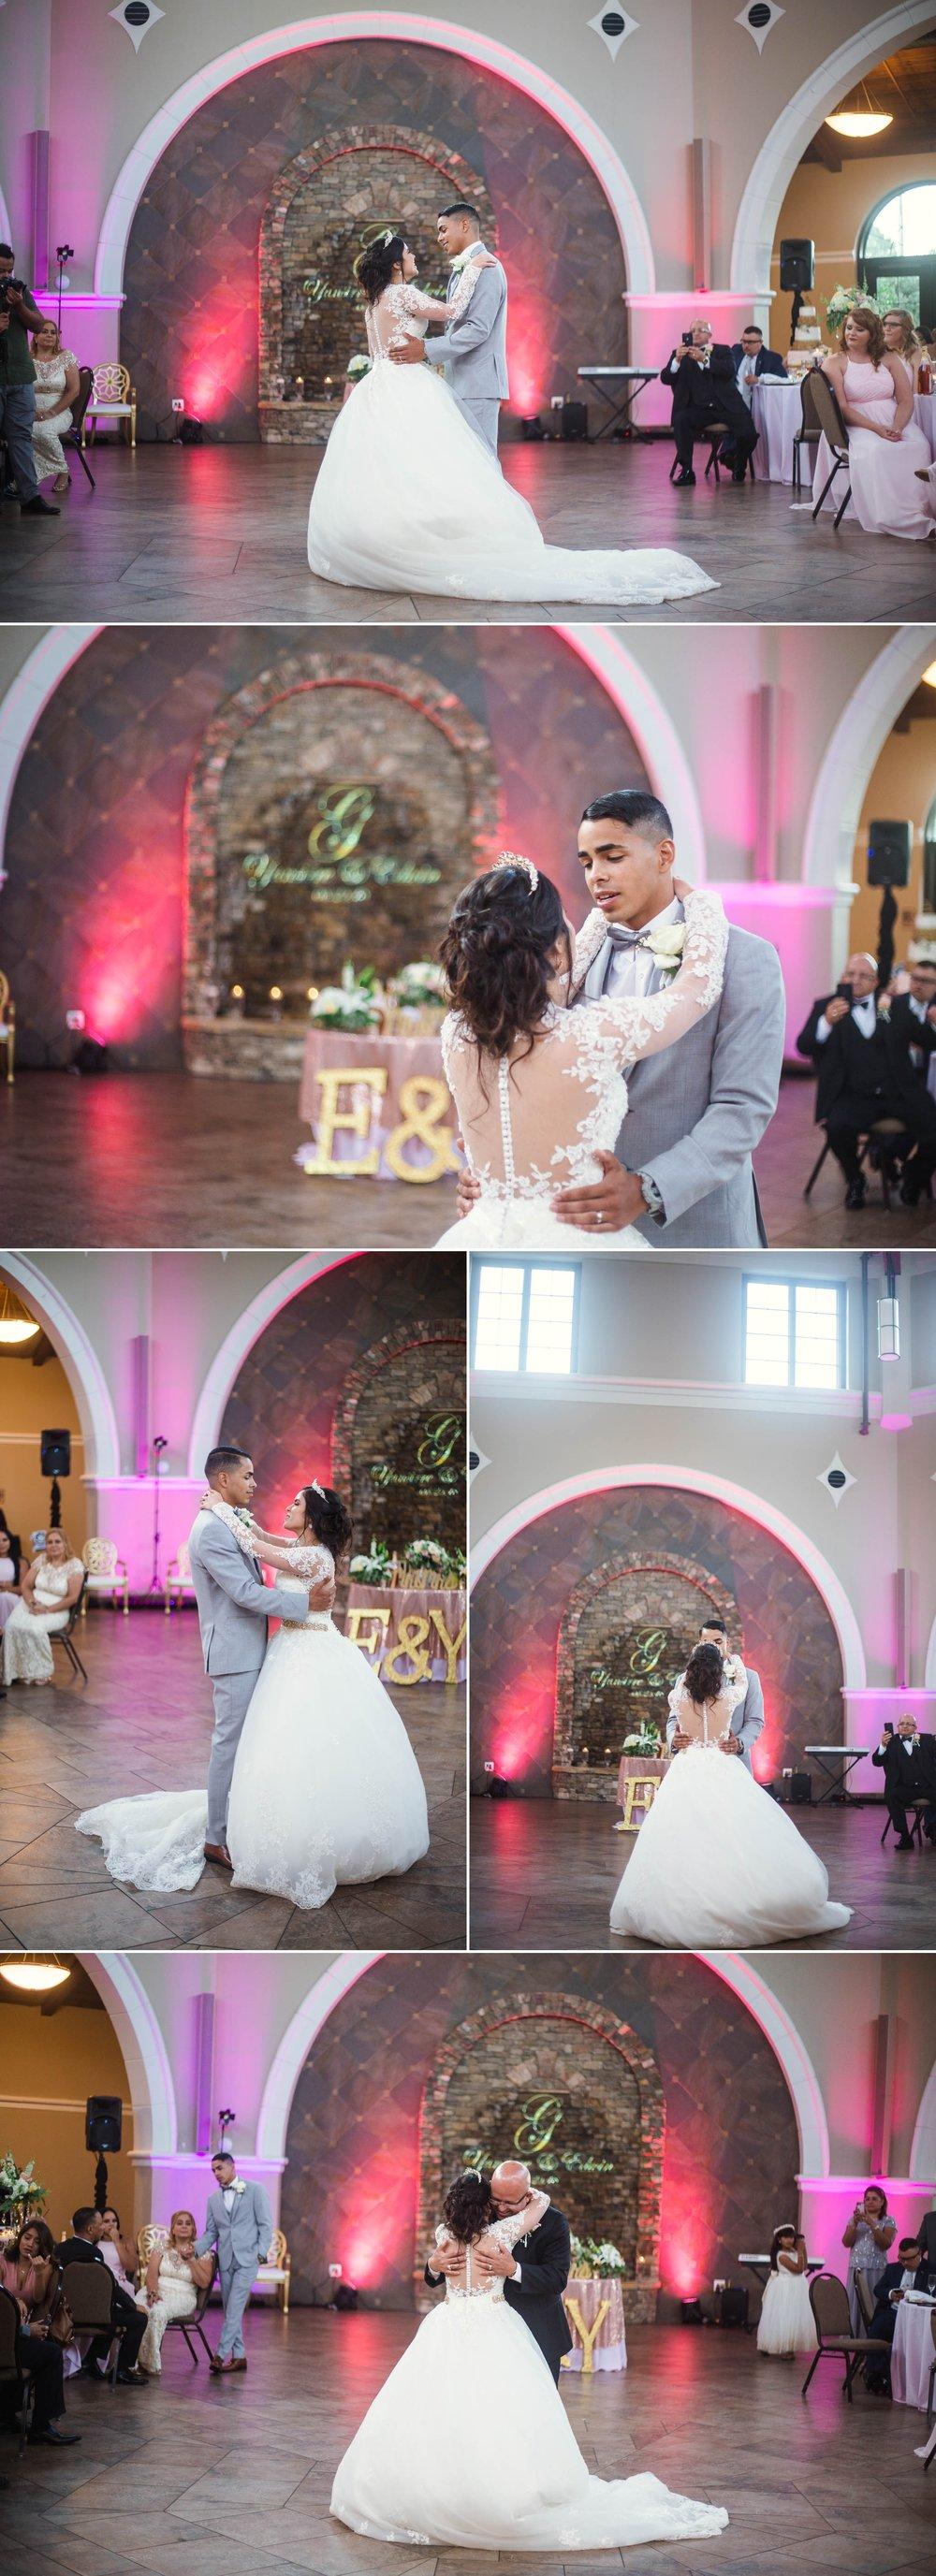 First Dance between Bride and Groom, Father Daughter Dance - Yansi + Eddie - Wedding at Cape Fear Botanical Garden - Fayetteville North Carolina Photographer